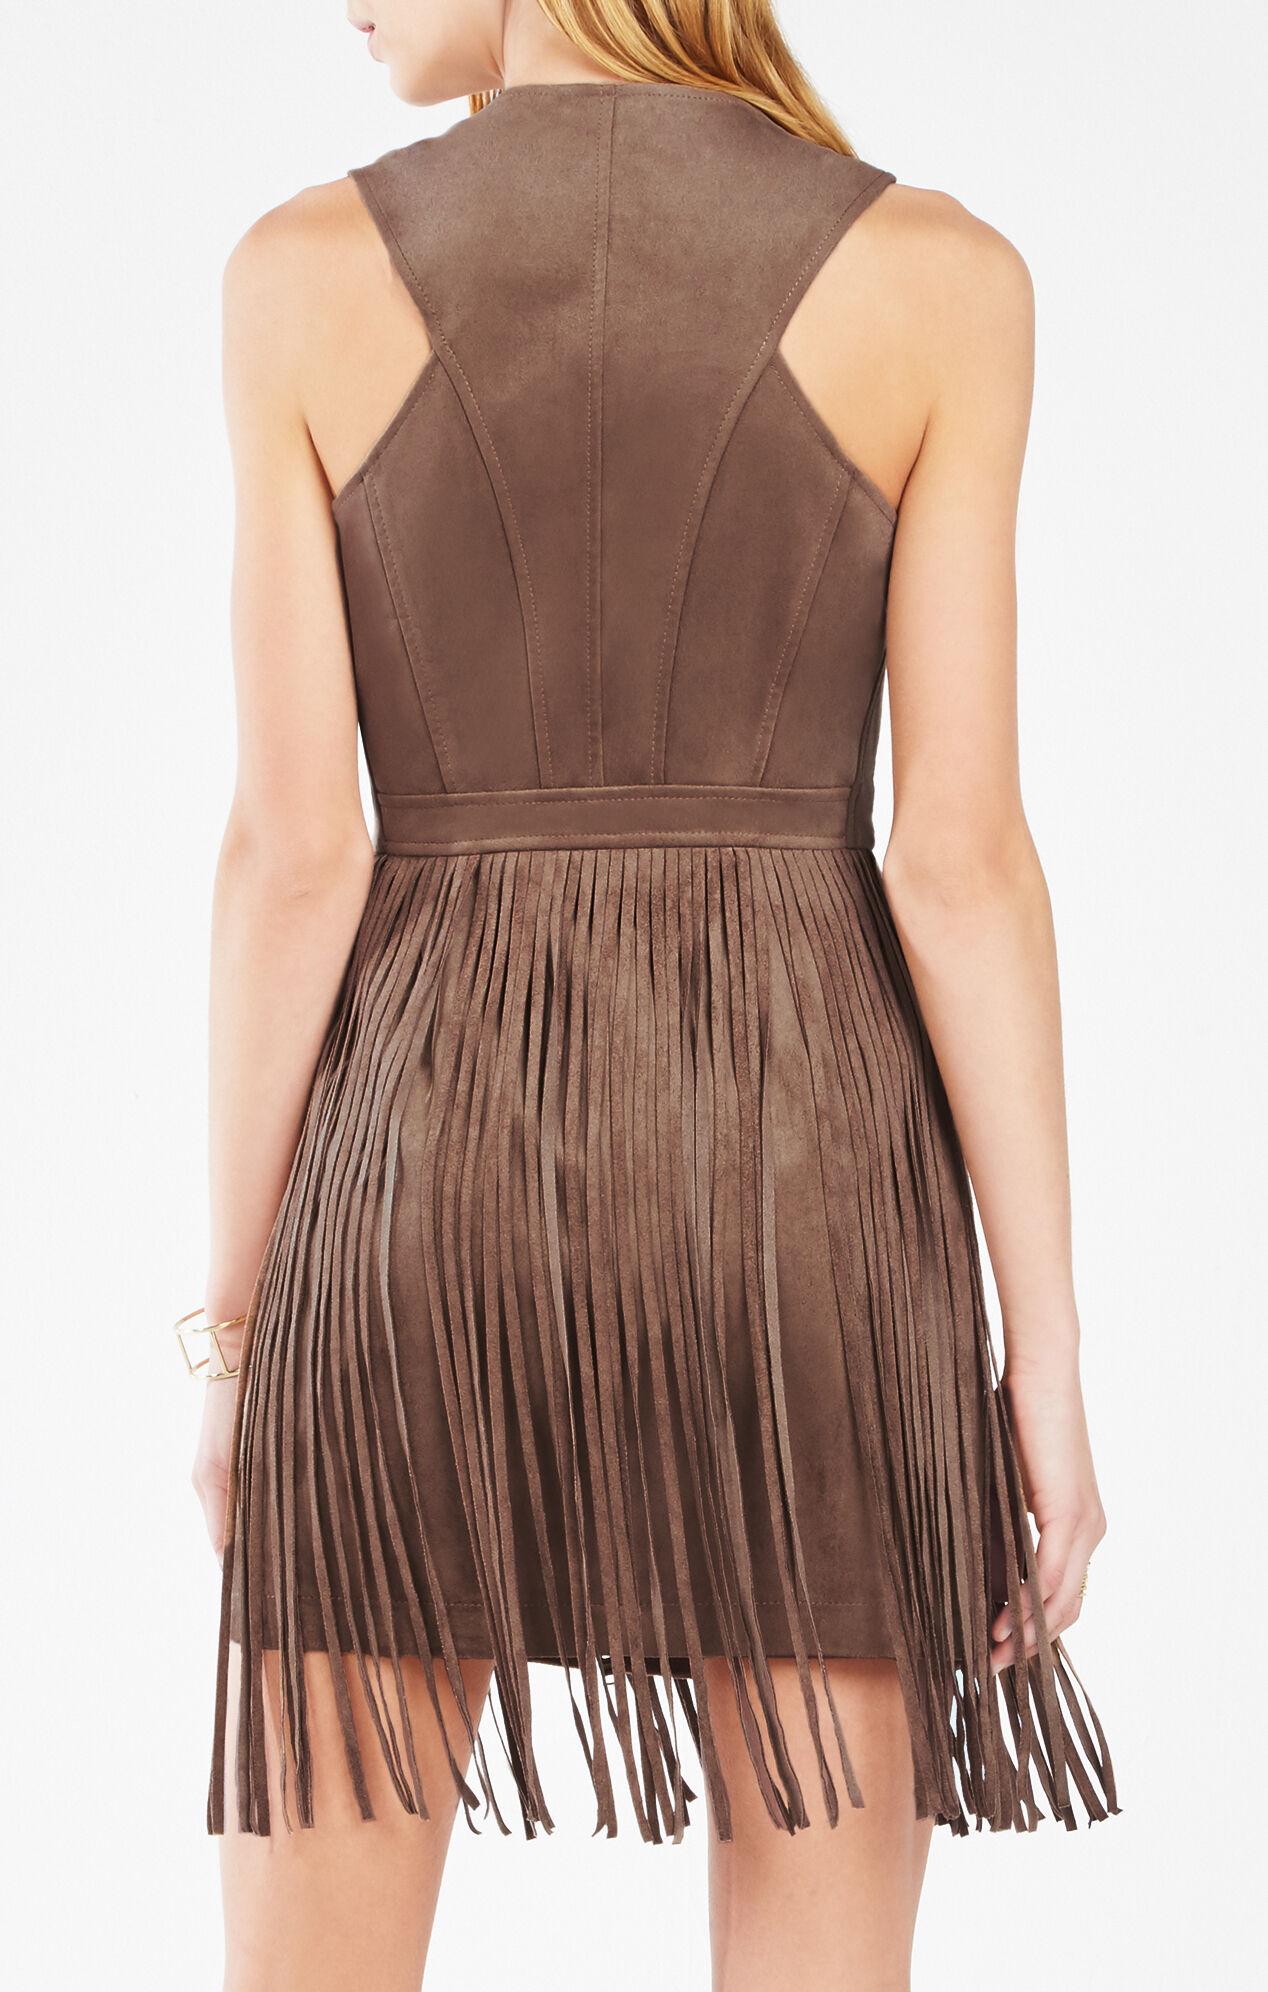 Hamiin Fringe Faux-Suede Vest Dress